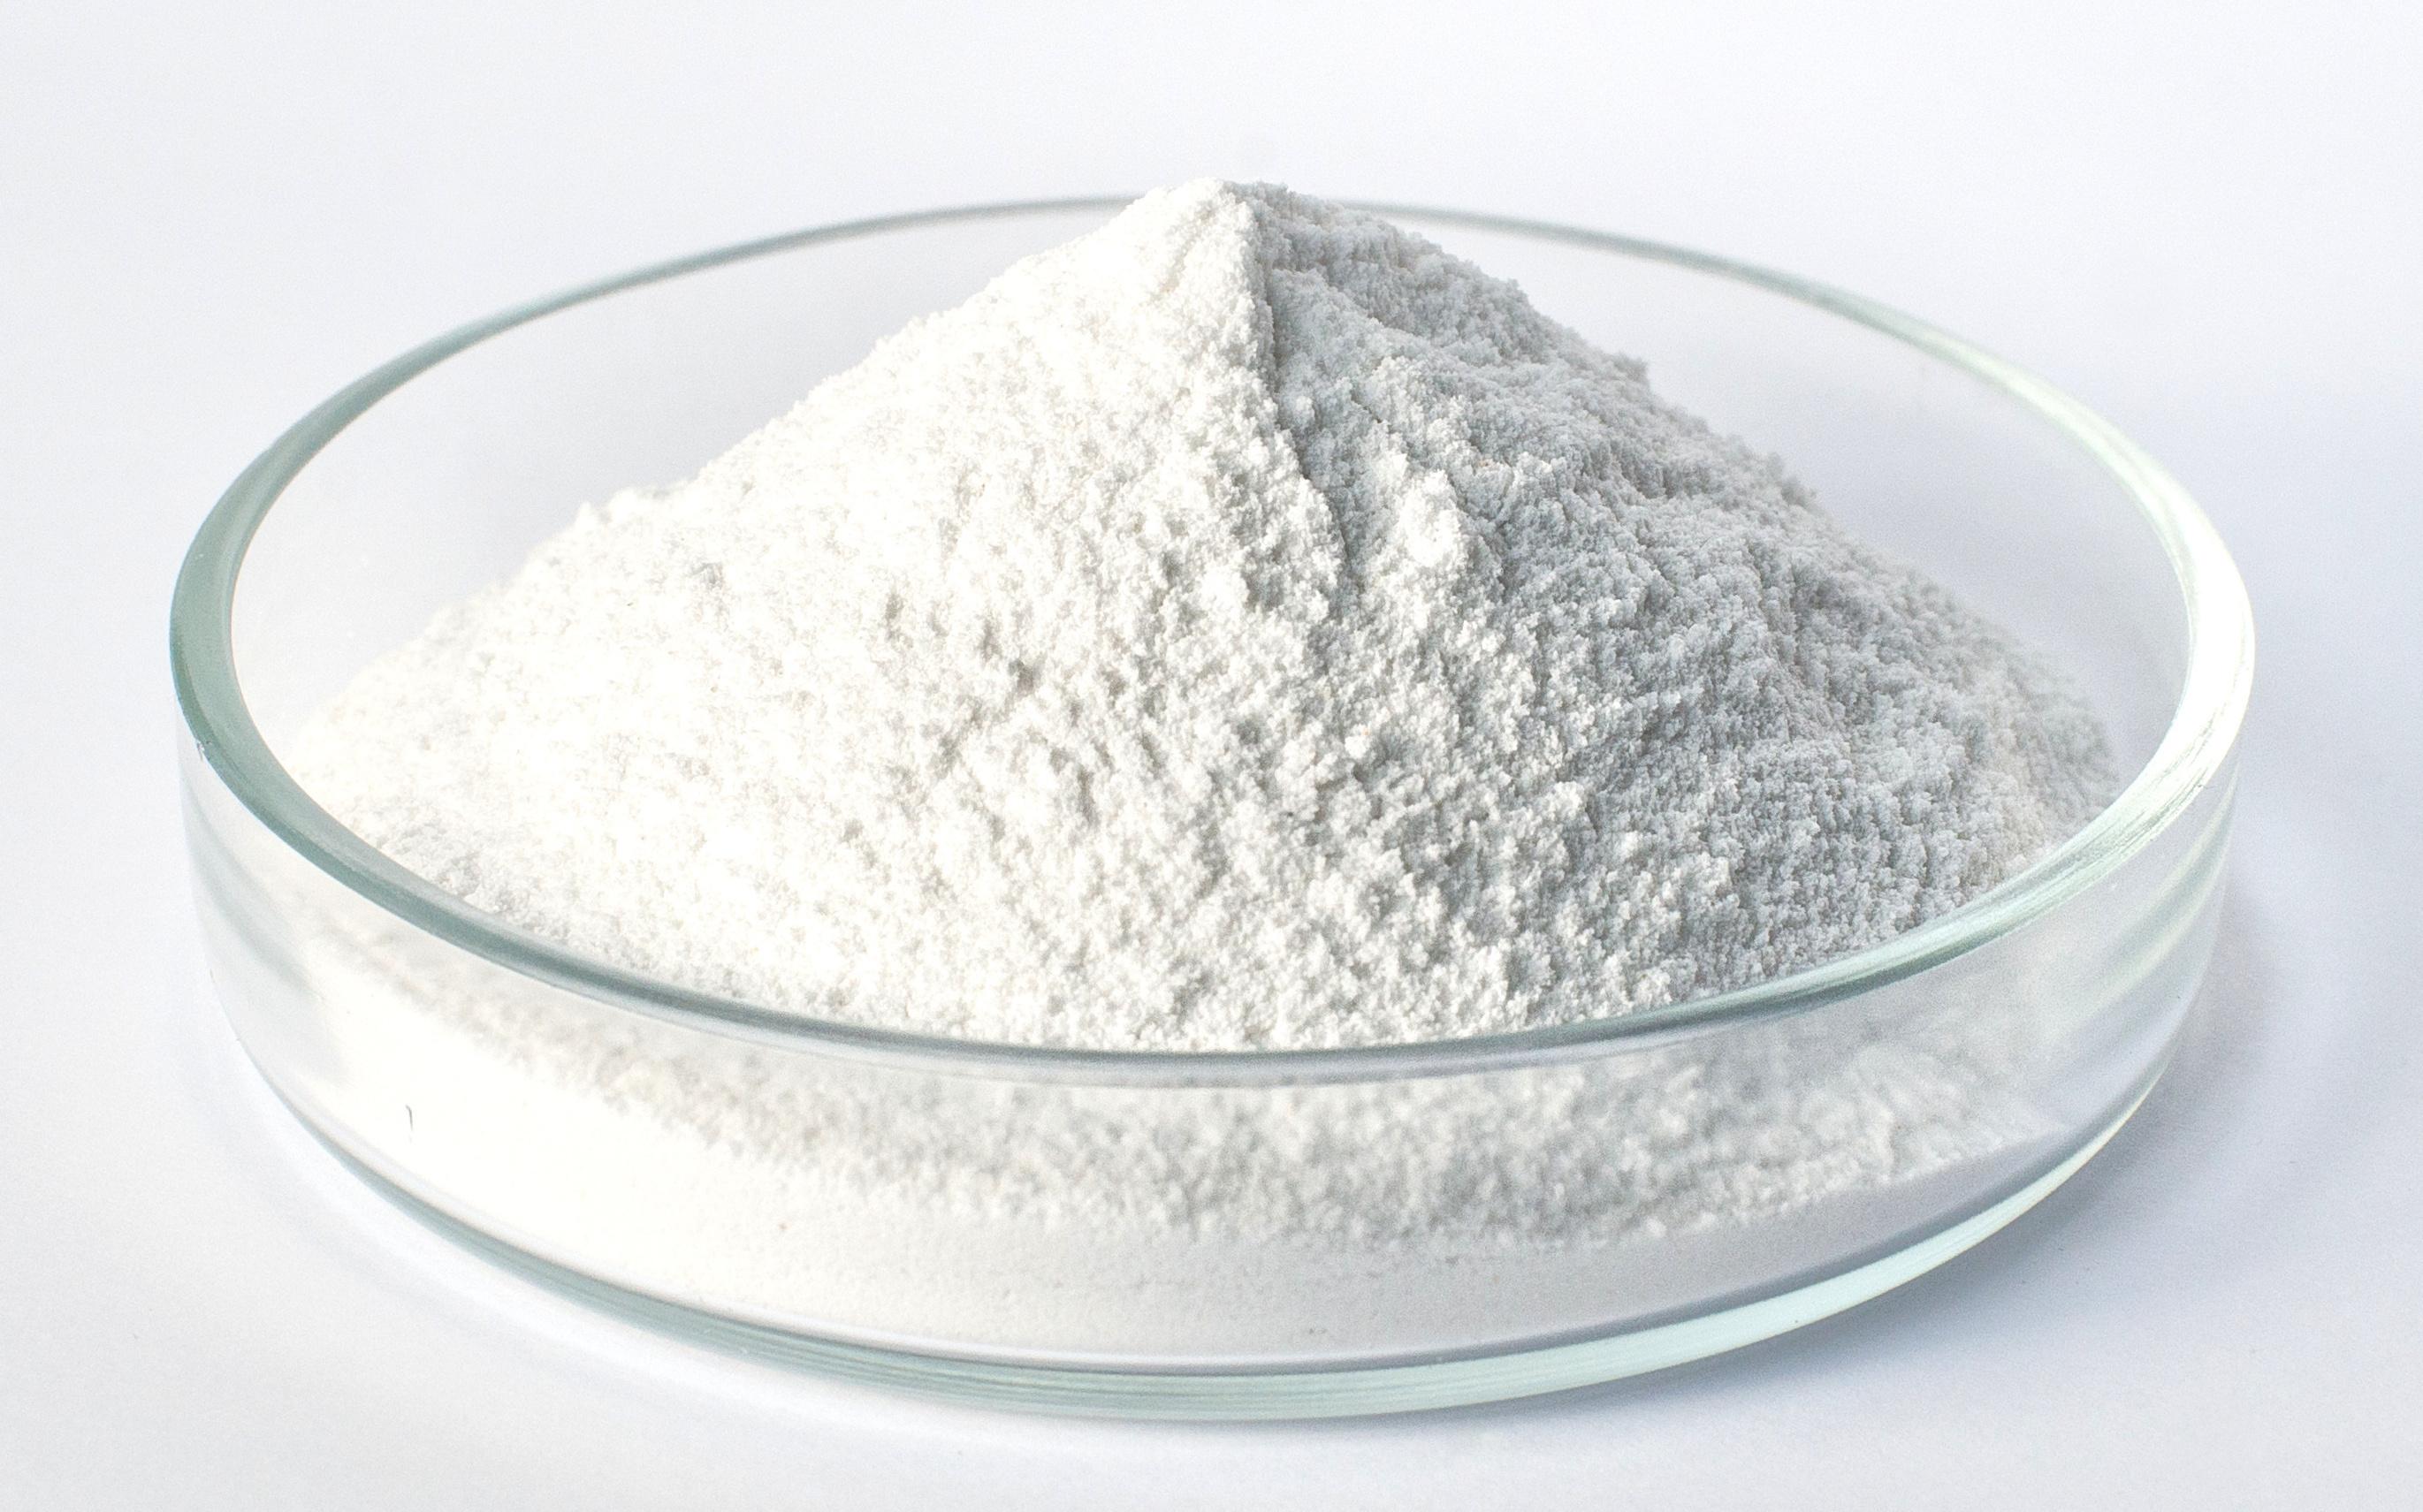 Barite Drilling Powder